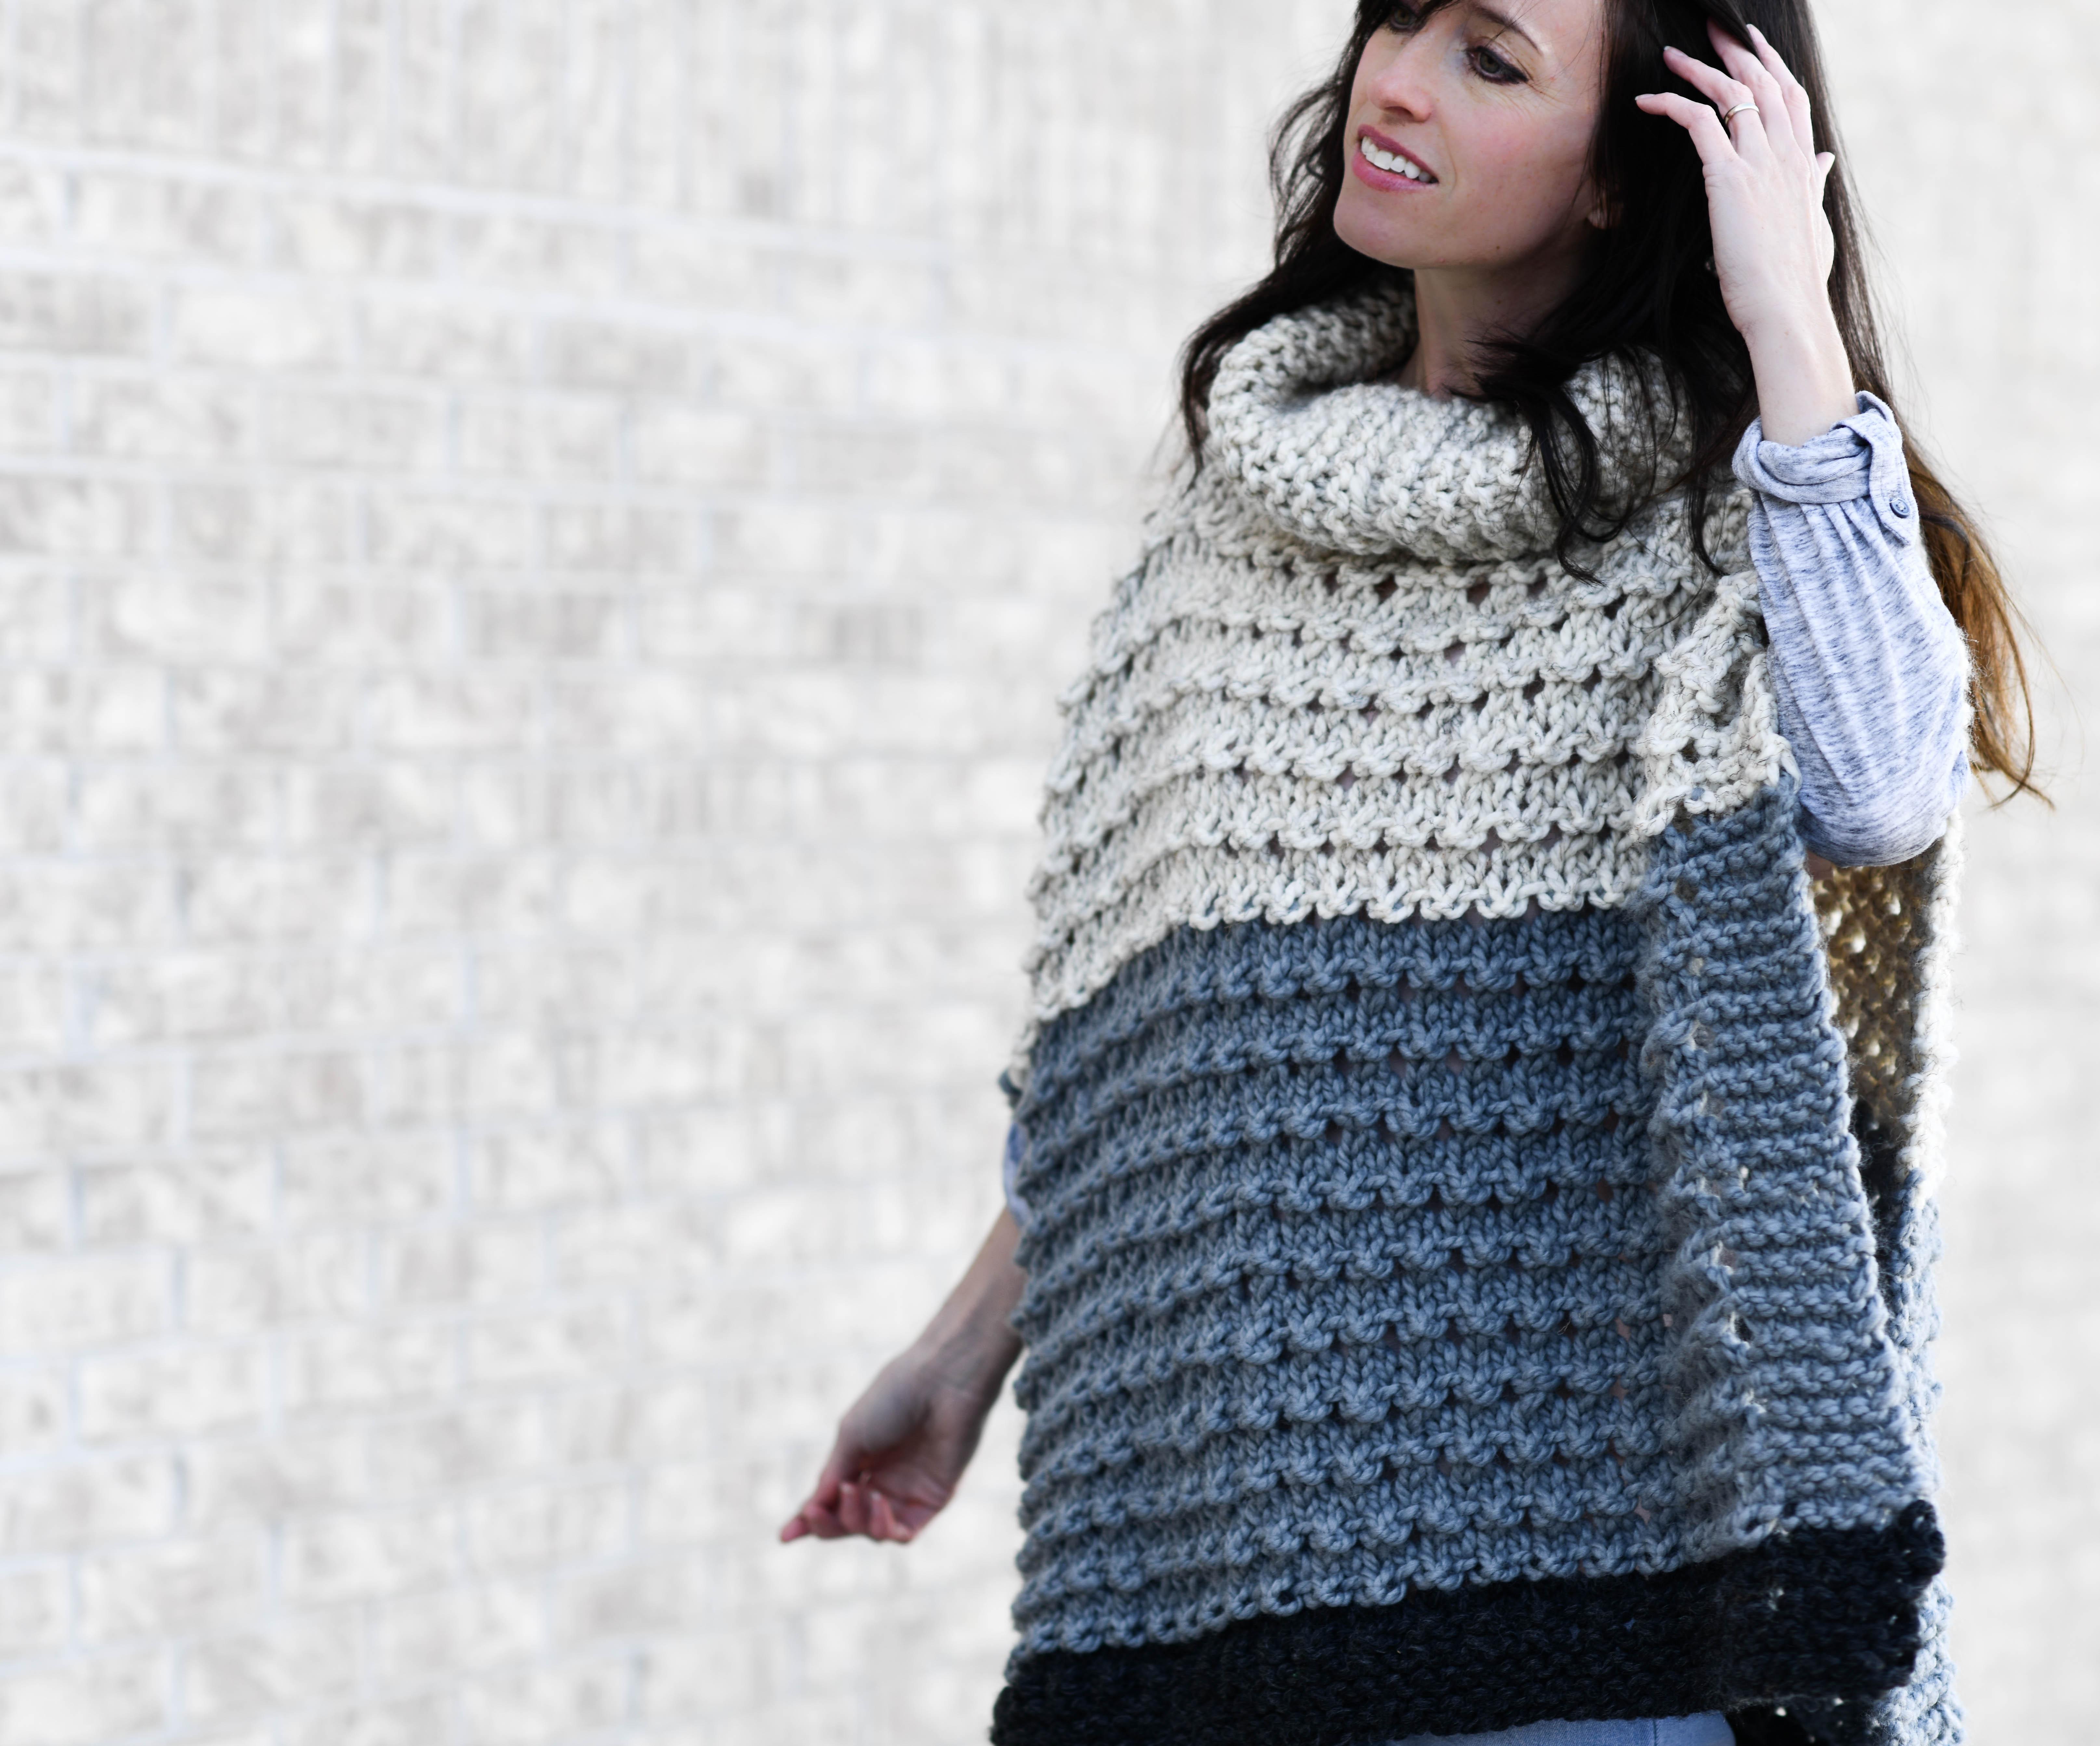 ea2bae4e9 Vail Ski Poncho Knitting Pattern – Mama In A Stitch